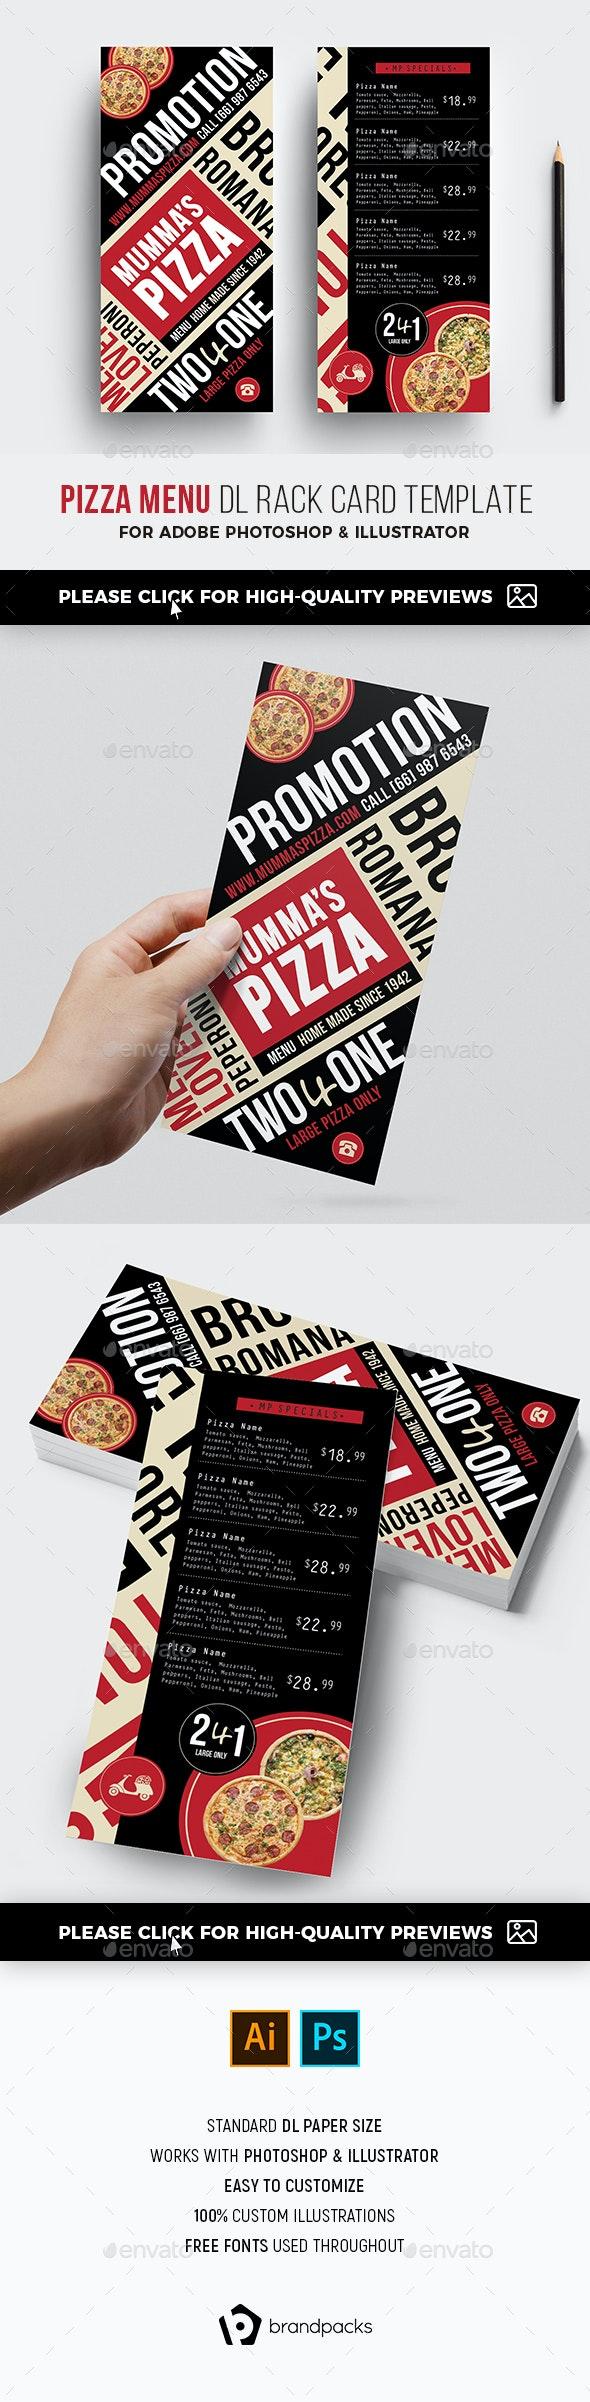 DL Pizza Menu Flyer - Restaurant Flyers